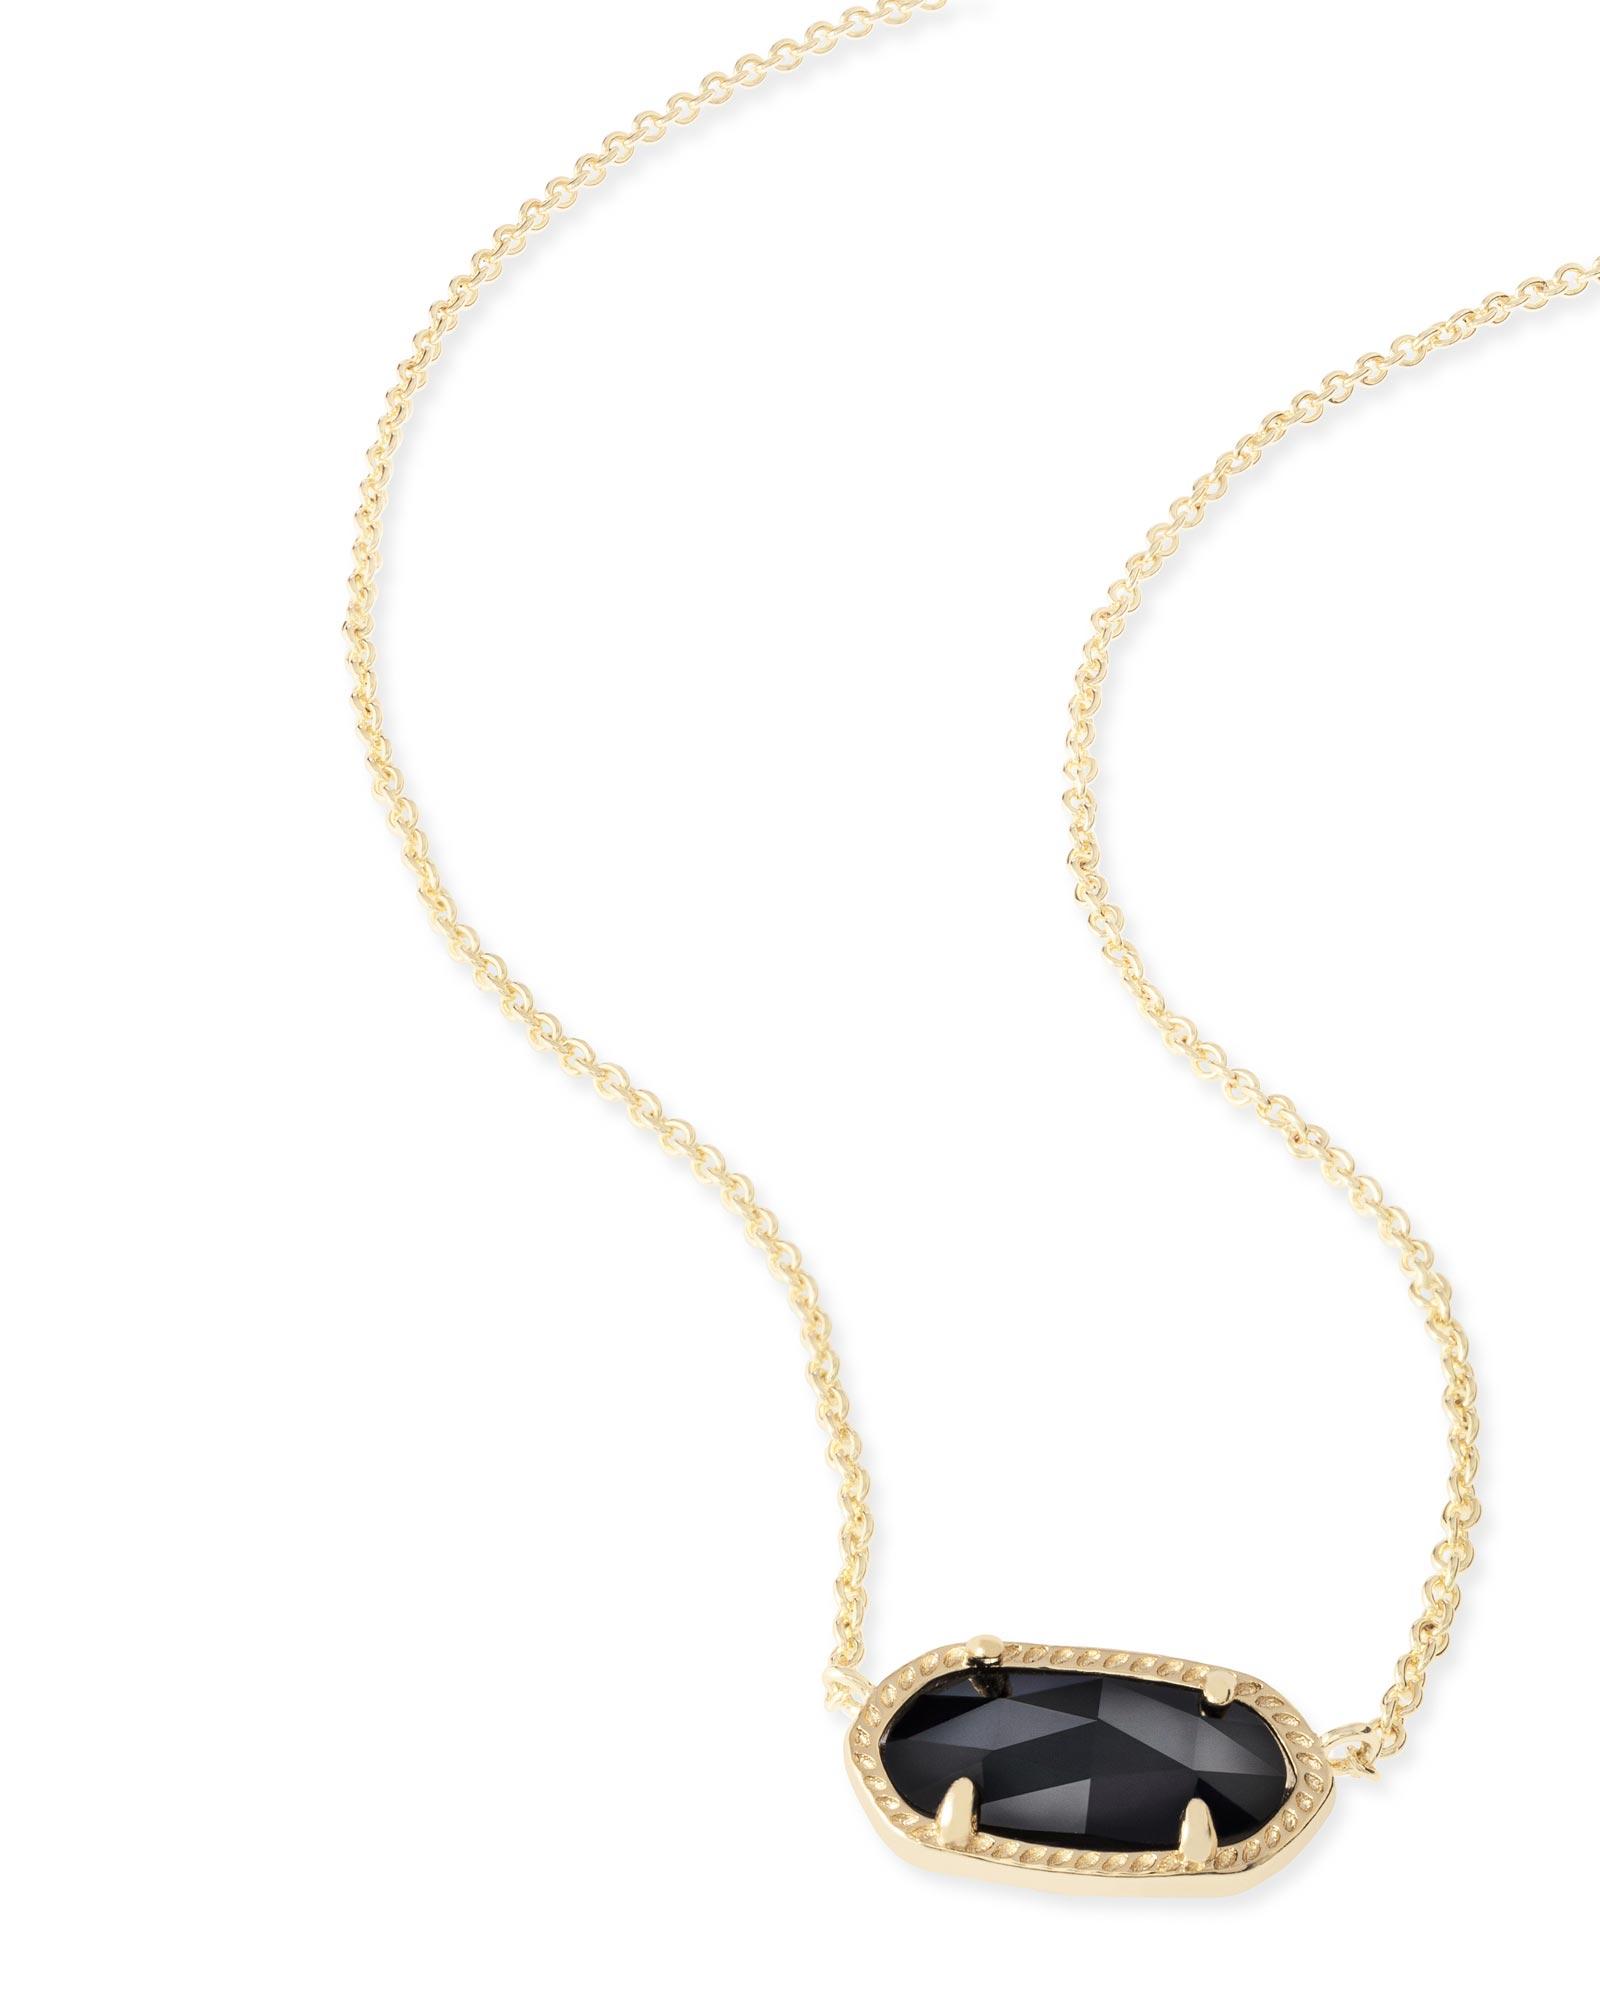 Elisa Gold Pendant Necklace in Black | Kendra Scott